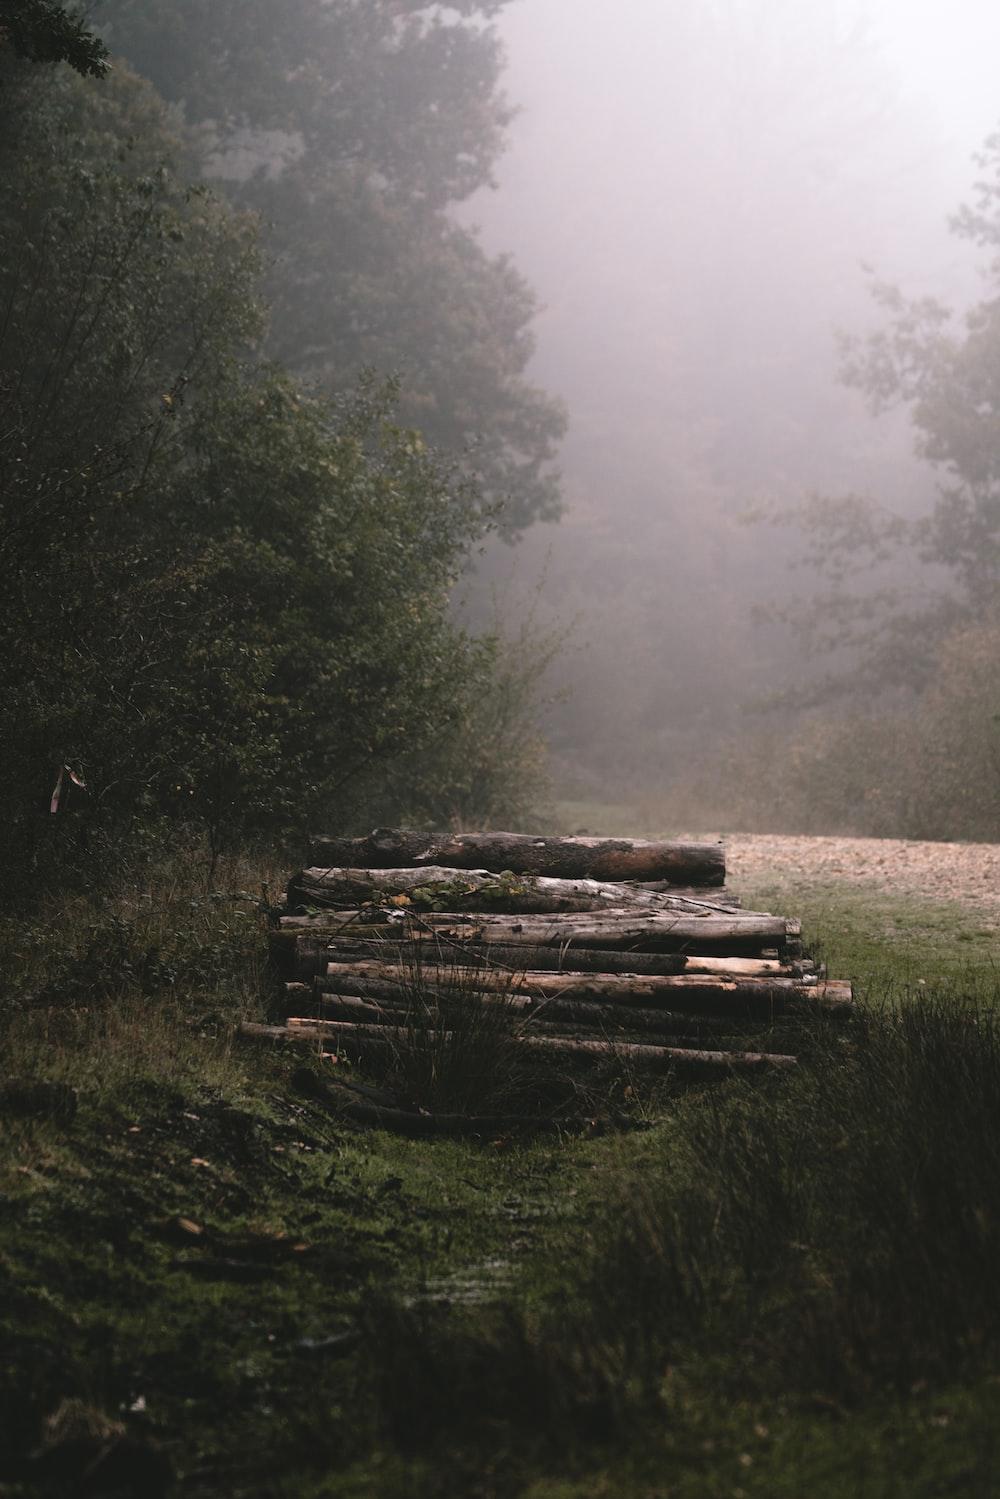 logs near trees